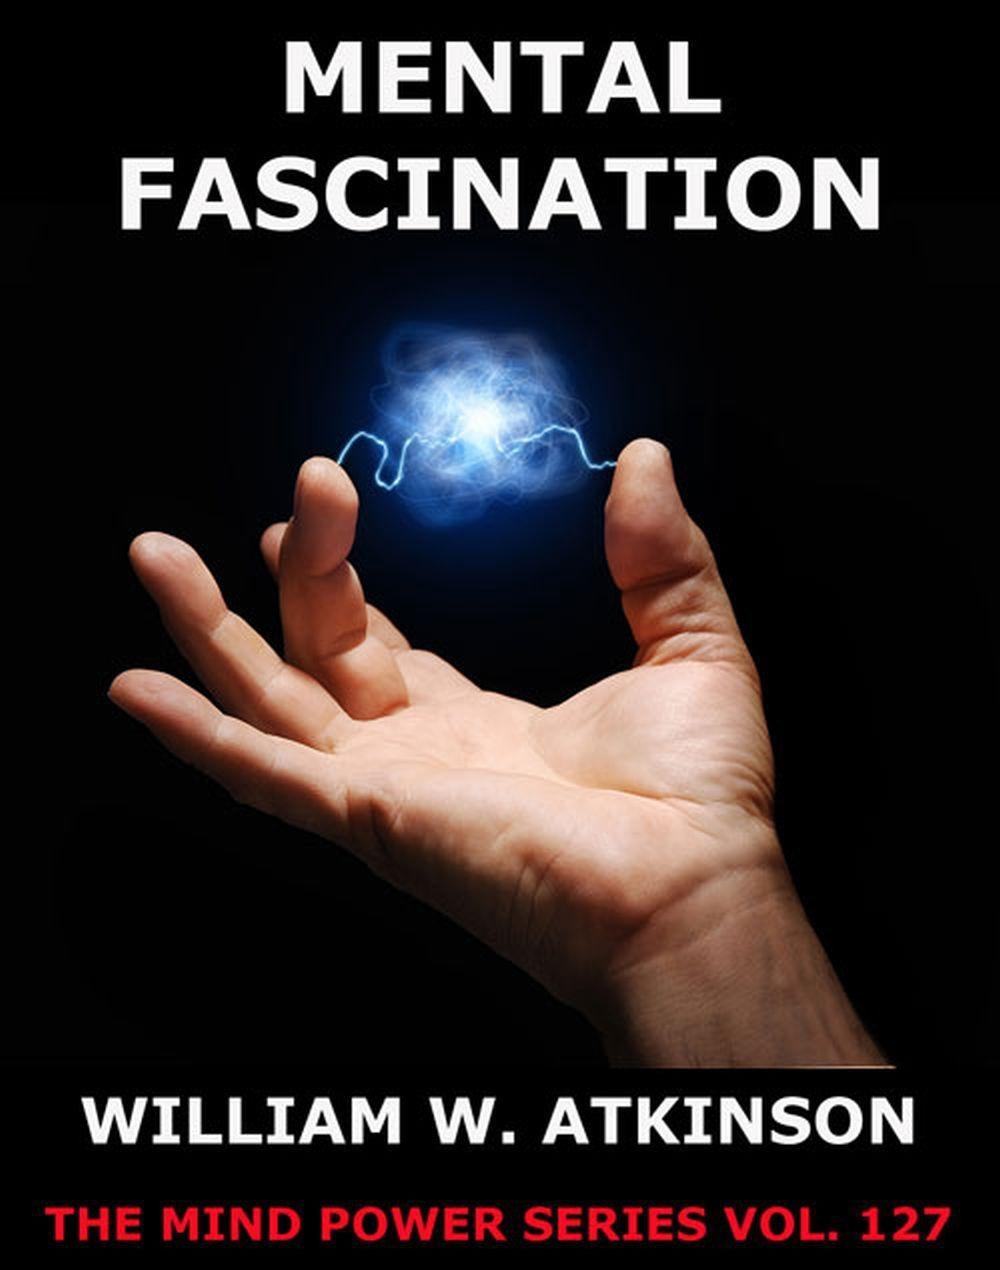 William Walker Atkinson Mental Fascination fascination